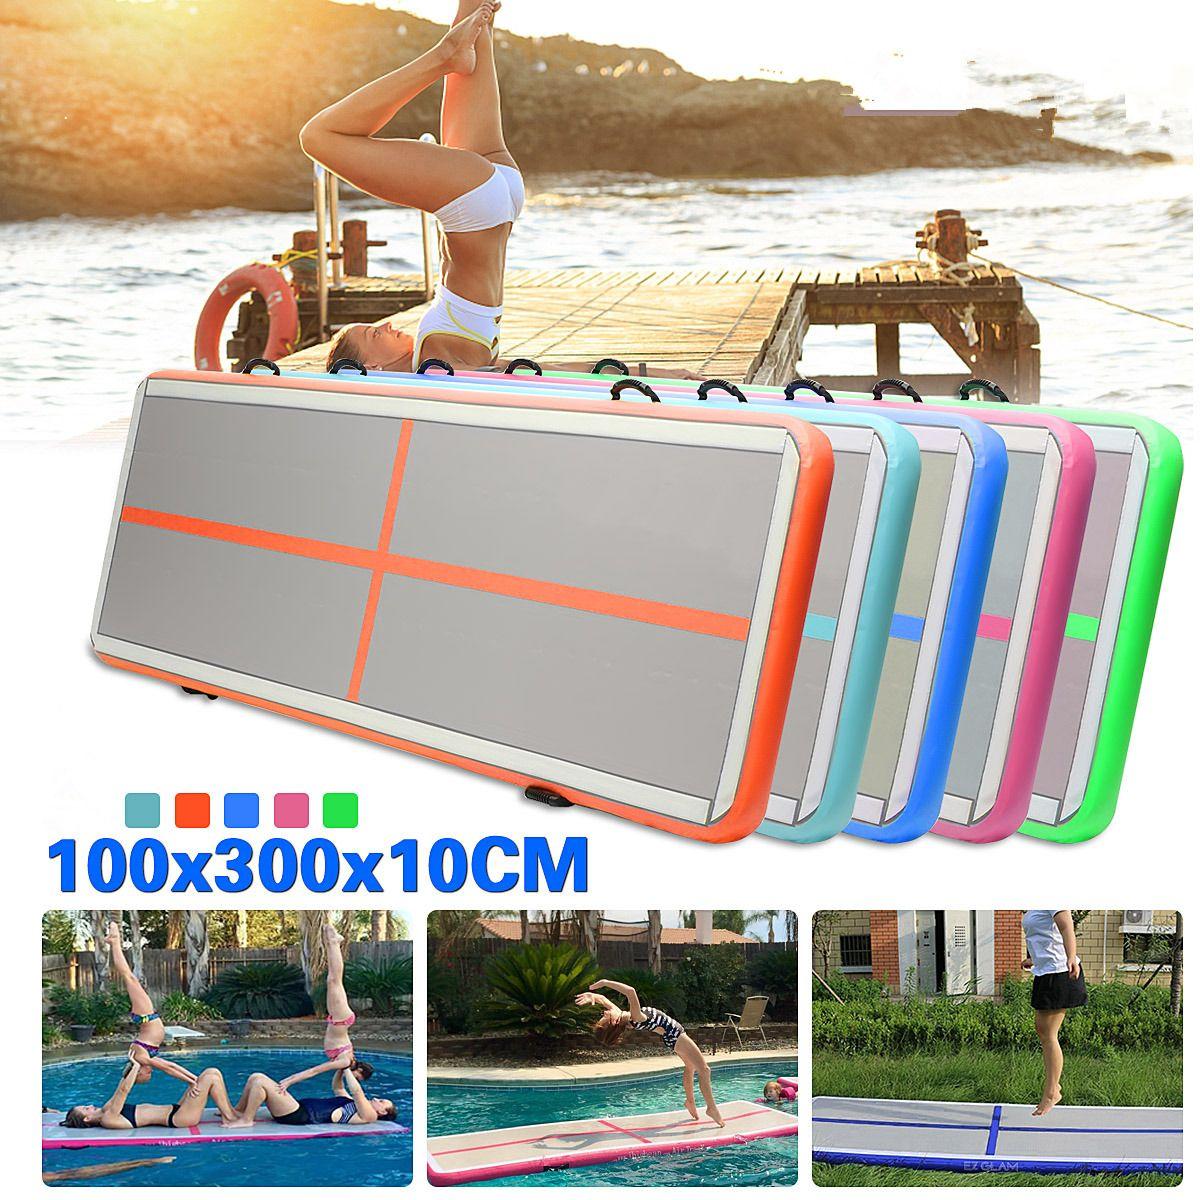 Gofun AirTrack Air Tumbling Track Training Gymnastics Mats Set Inflatable Balance Equipment Exercise 100*300*10cm 5 Colors